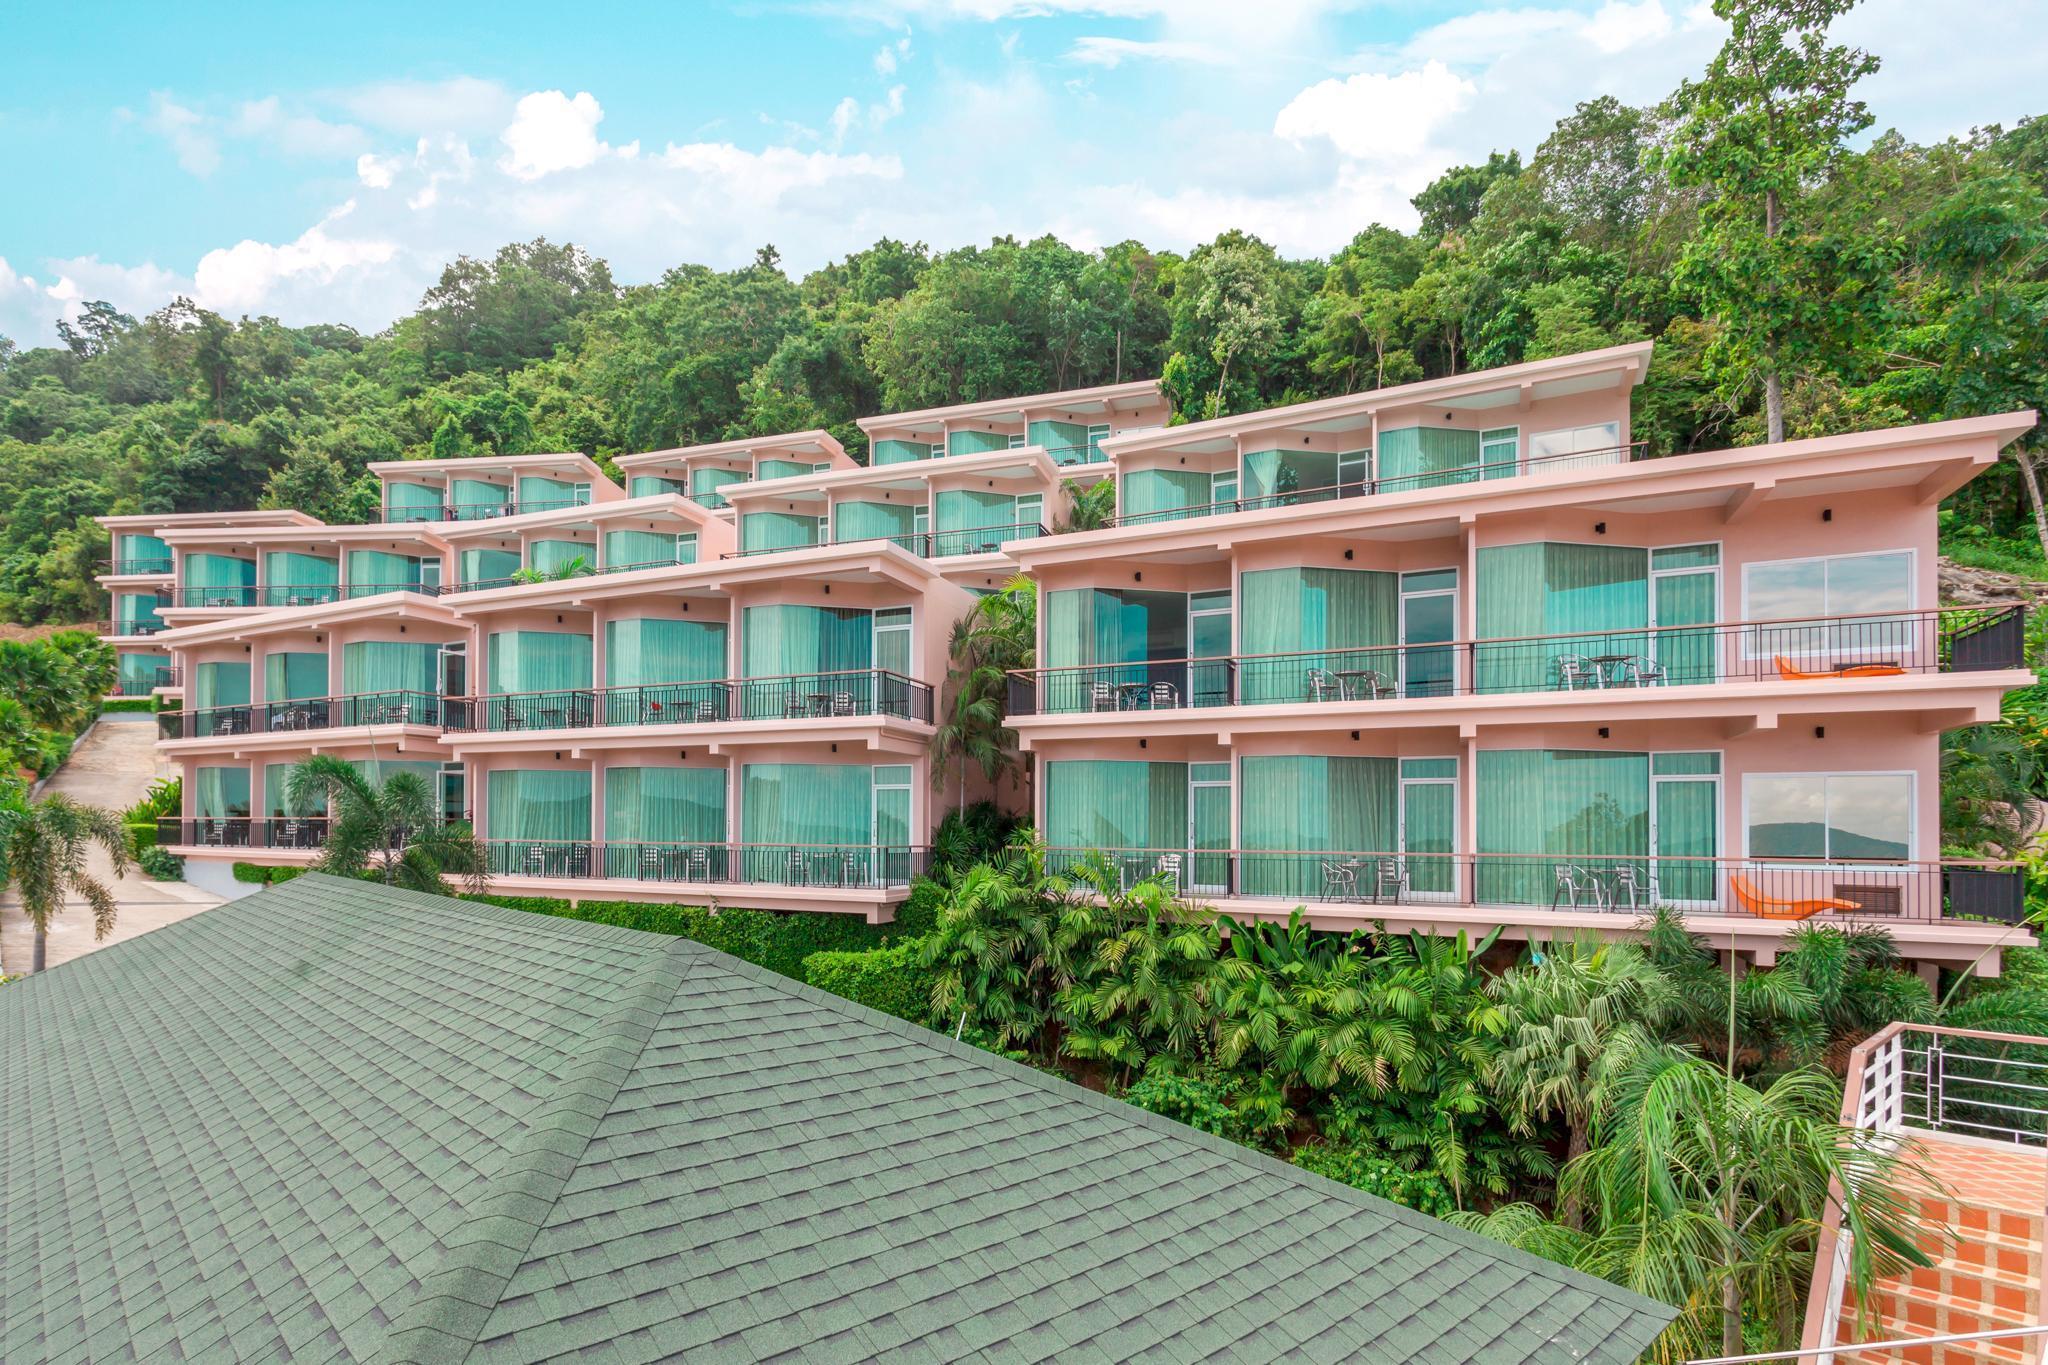 The View Rawada Phuket เดอะ วิว ราวาดา ภูเก็ต